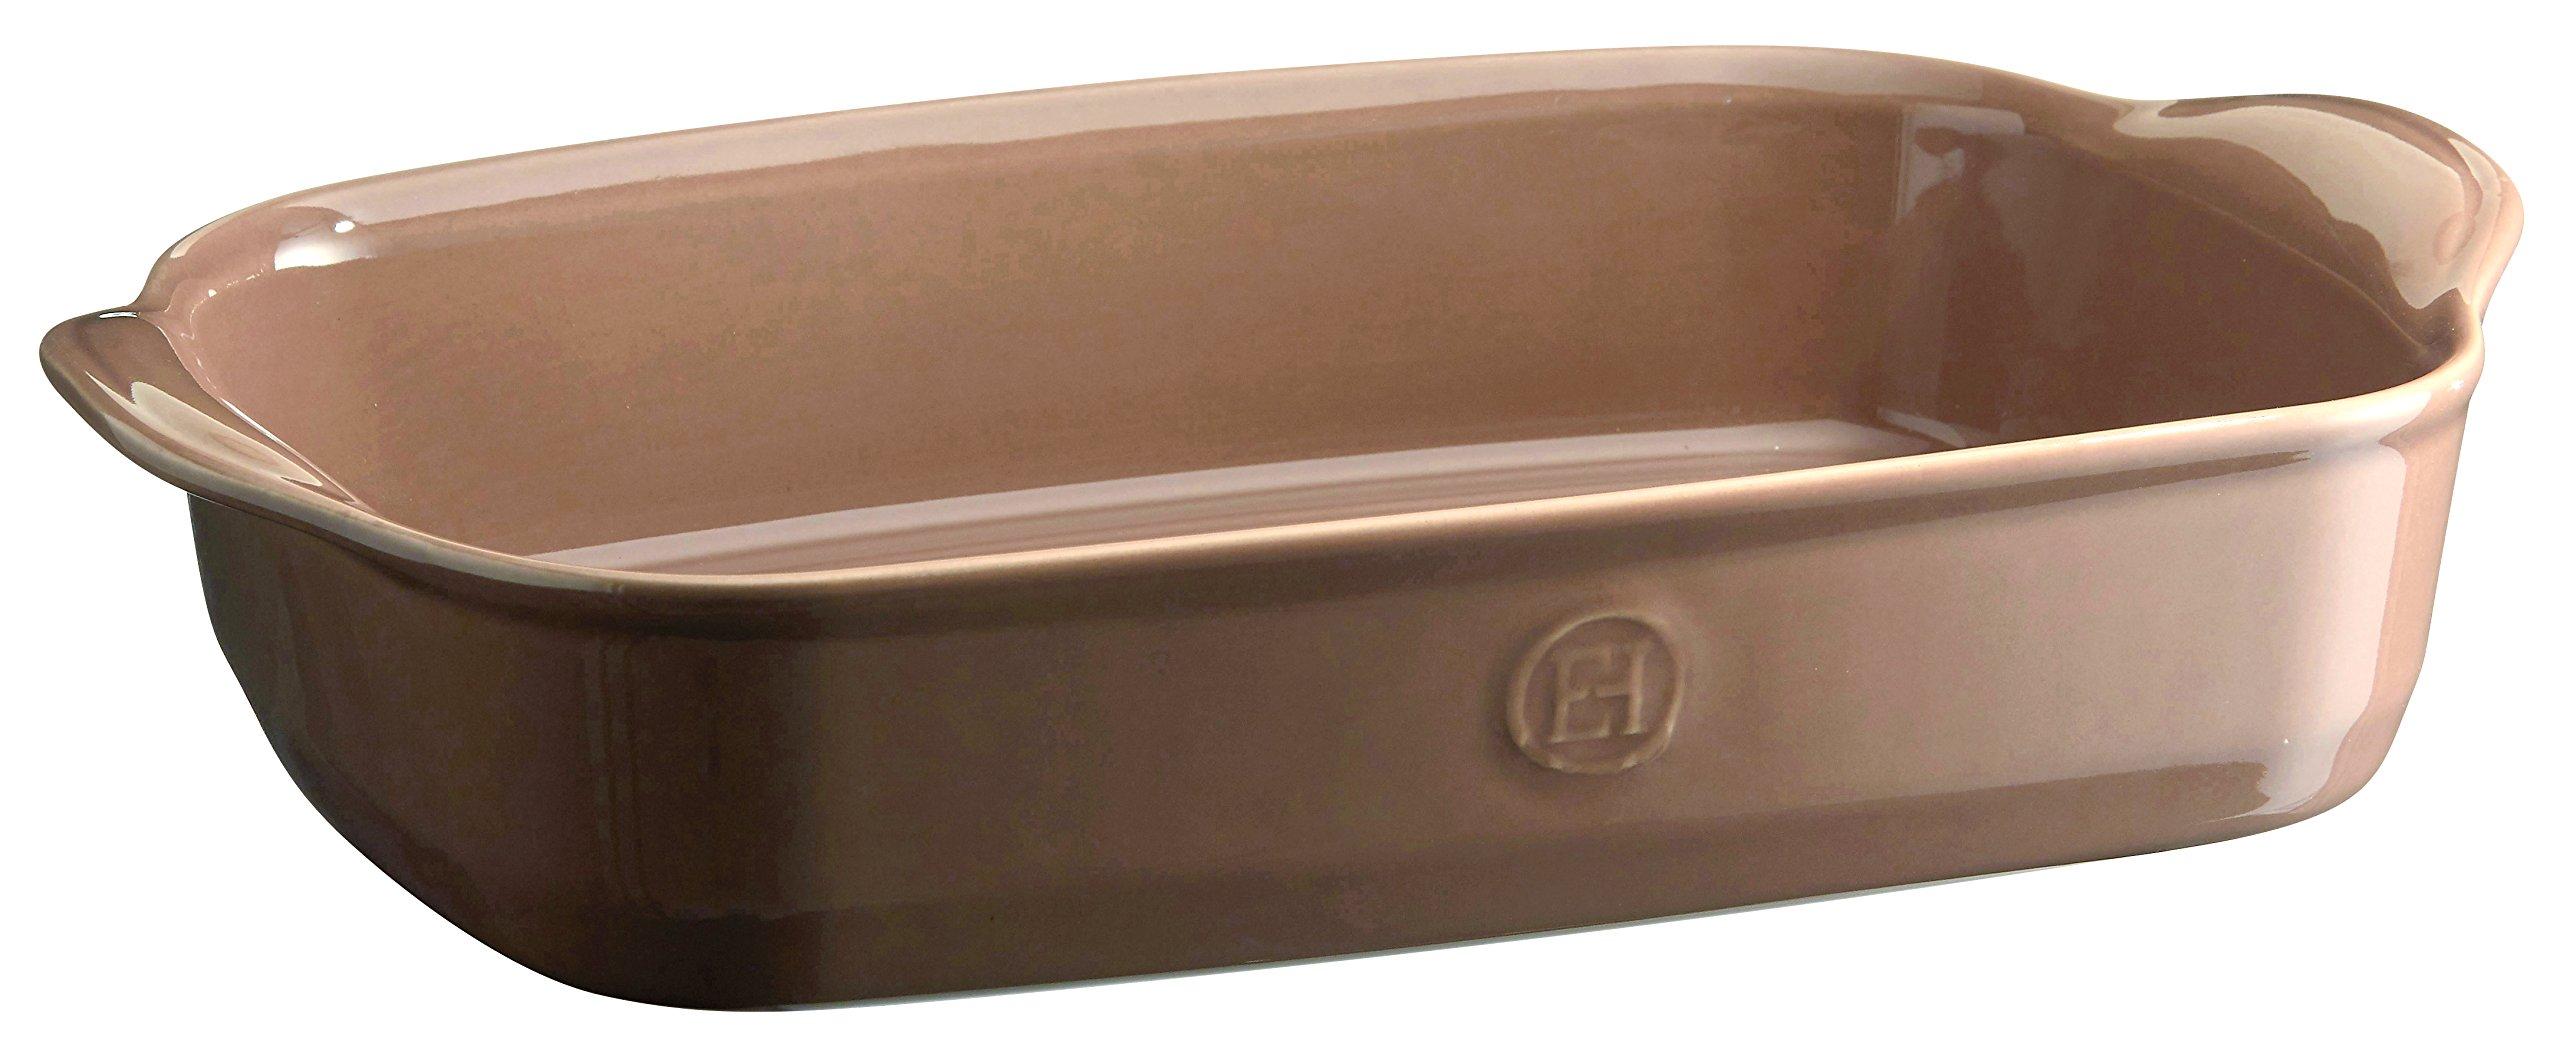 Emile Henry 969652 France Ovenware Ultime Rectangular Baking Dish, 14.2 x 9.1, Oak